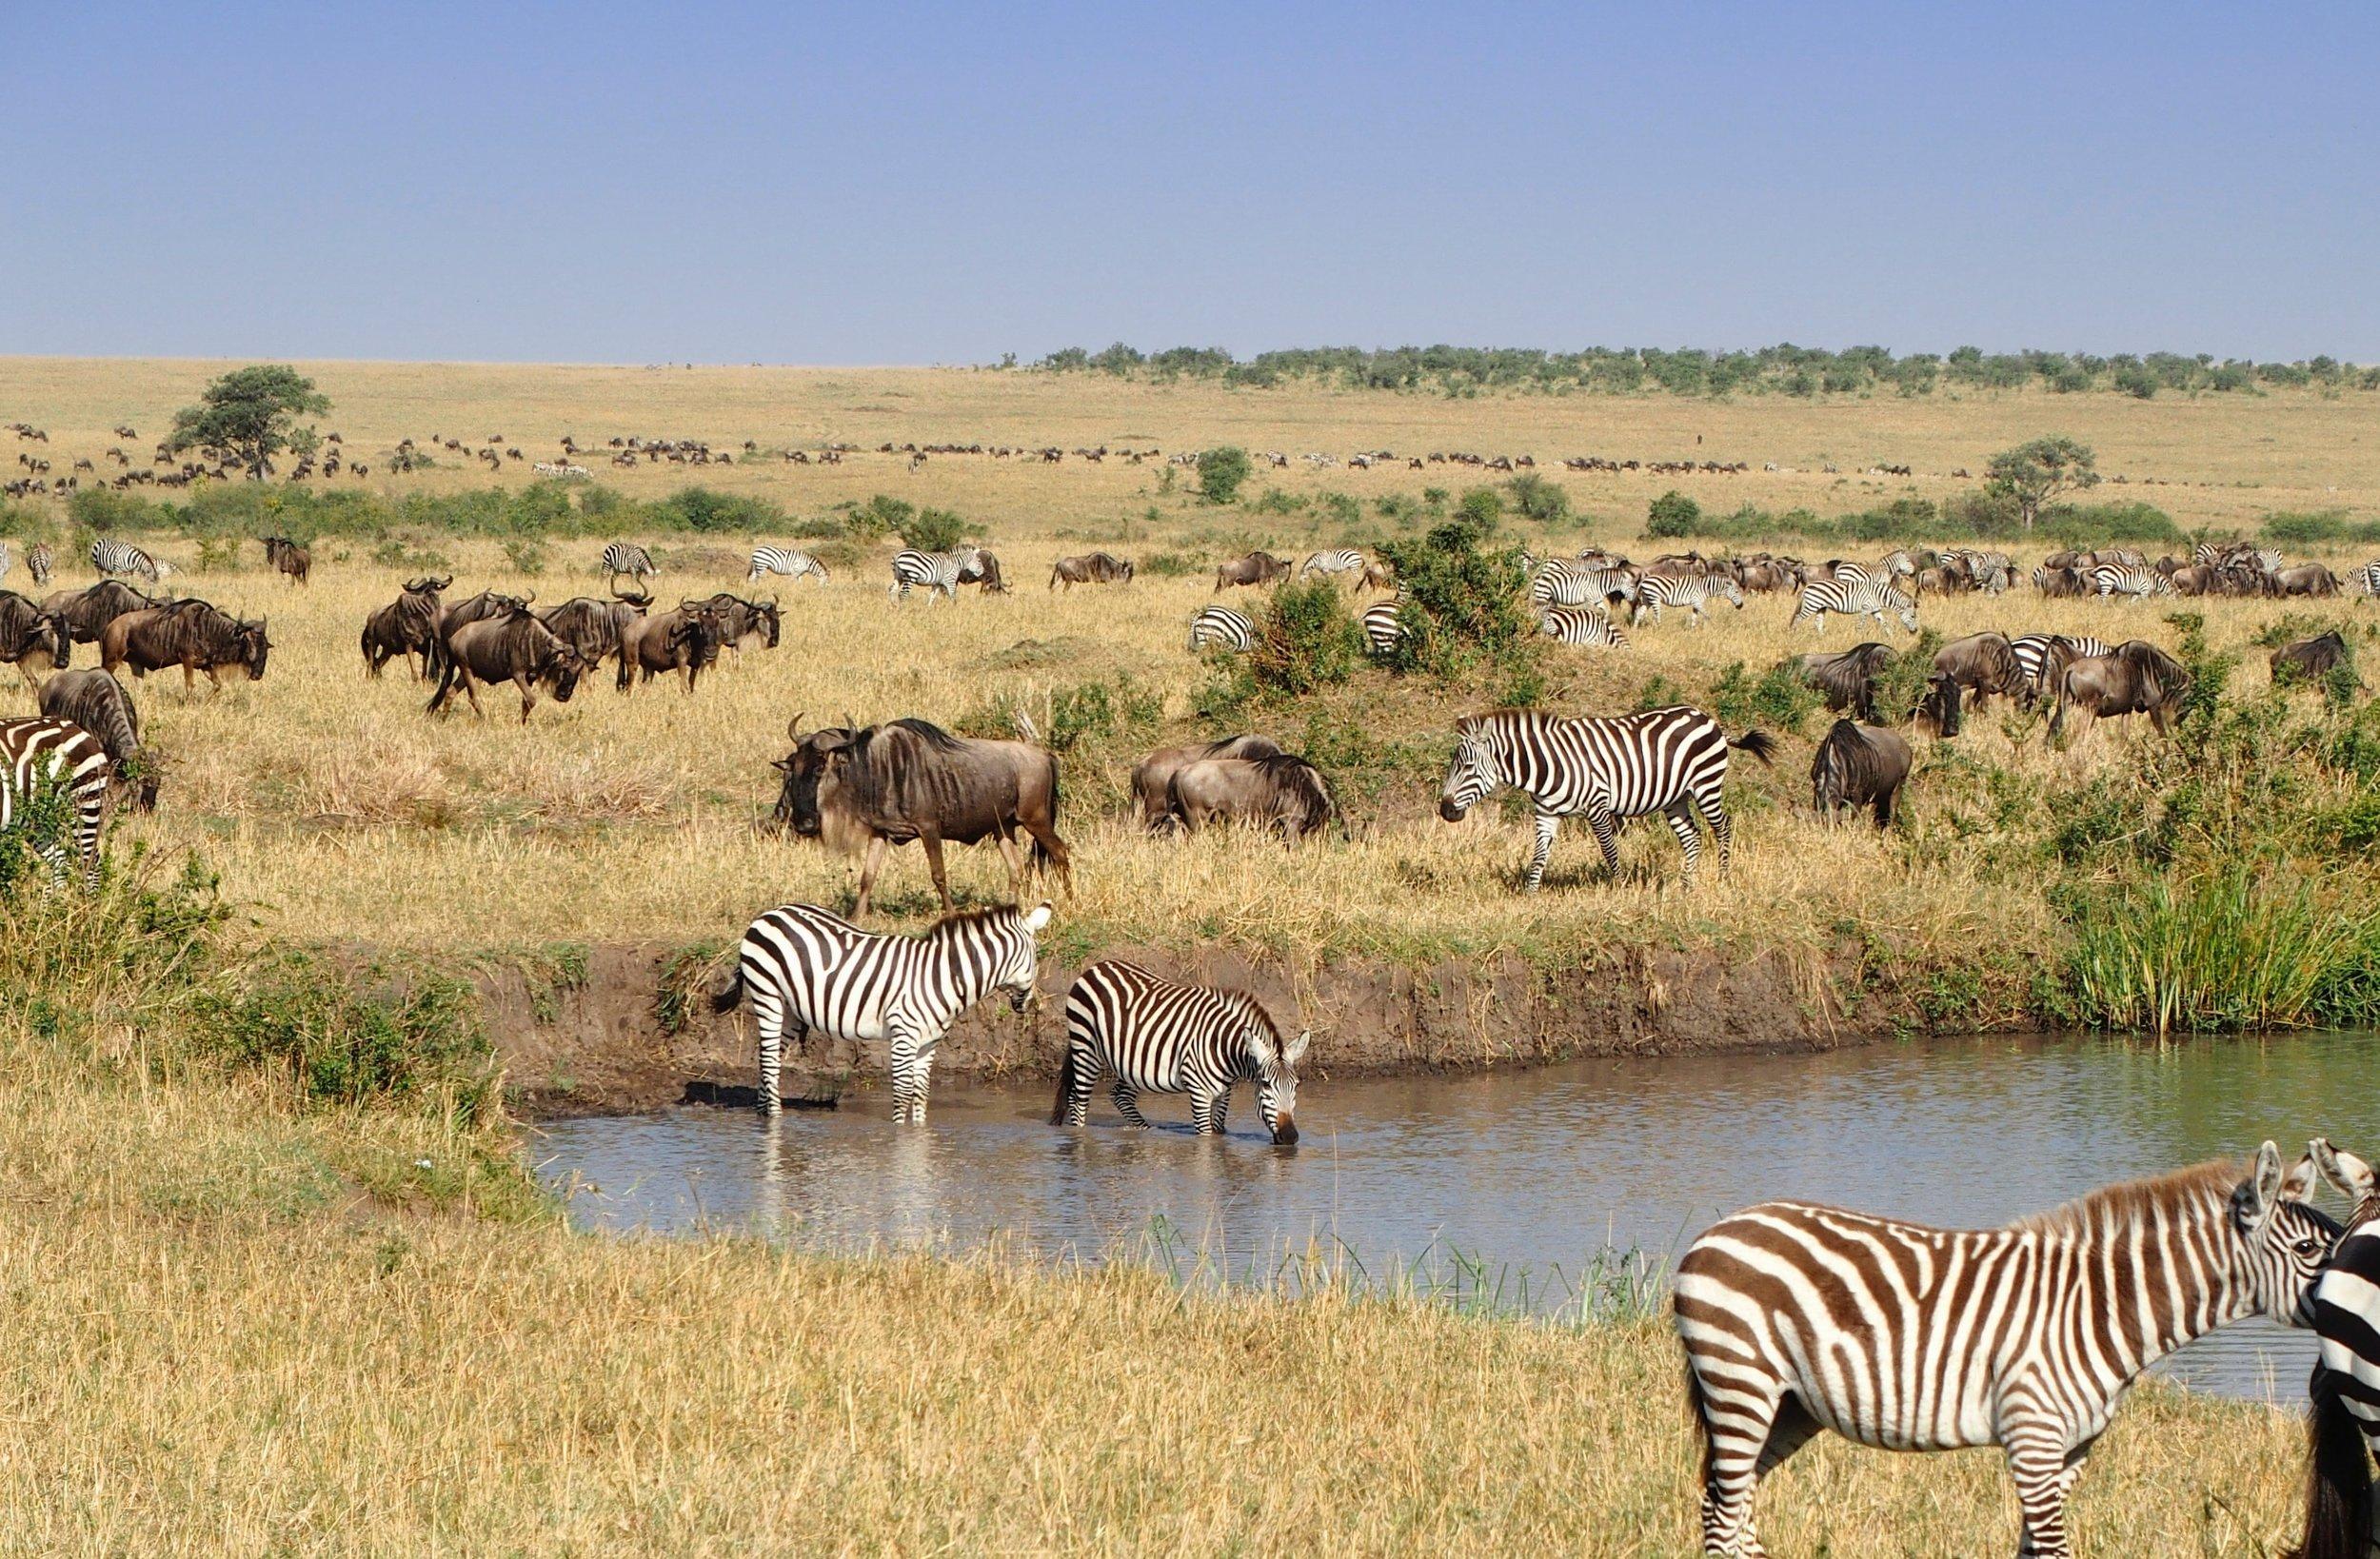 Masai Mara, Africa. Photo by  Michael Rodock  on  Unsplash